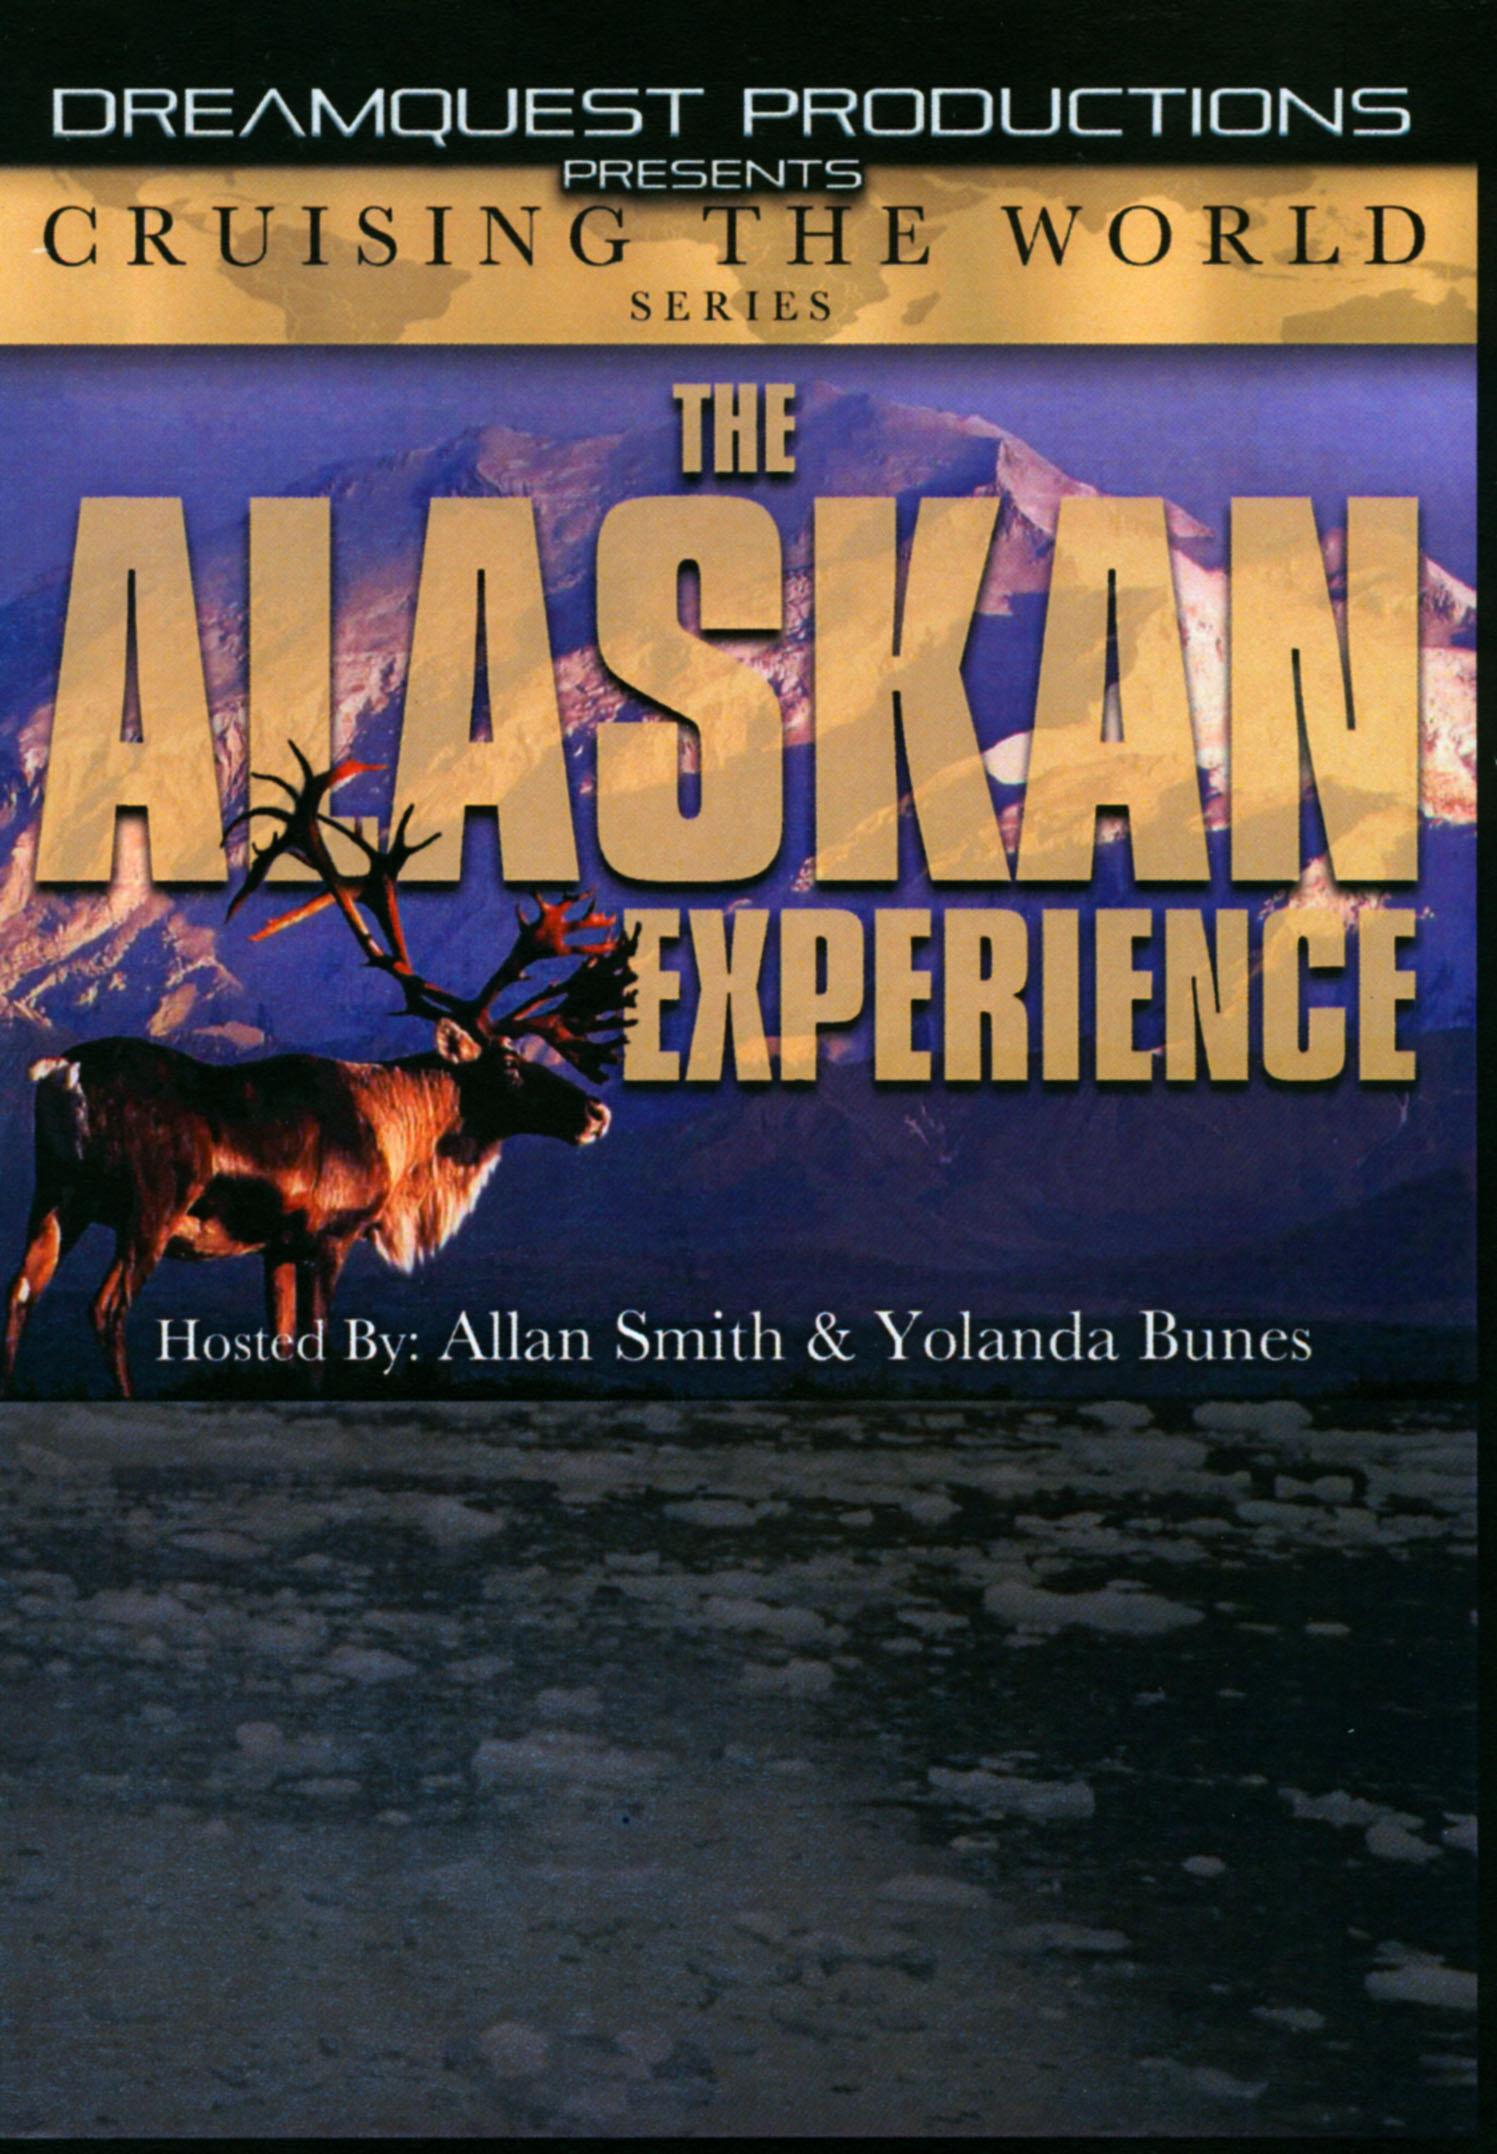 Cruising The World: The Alaskan Experience